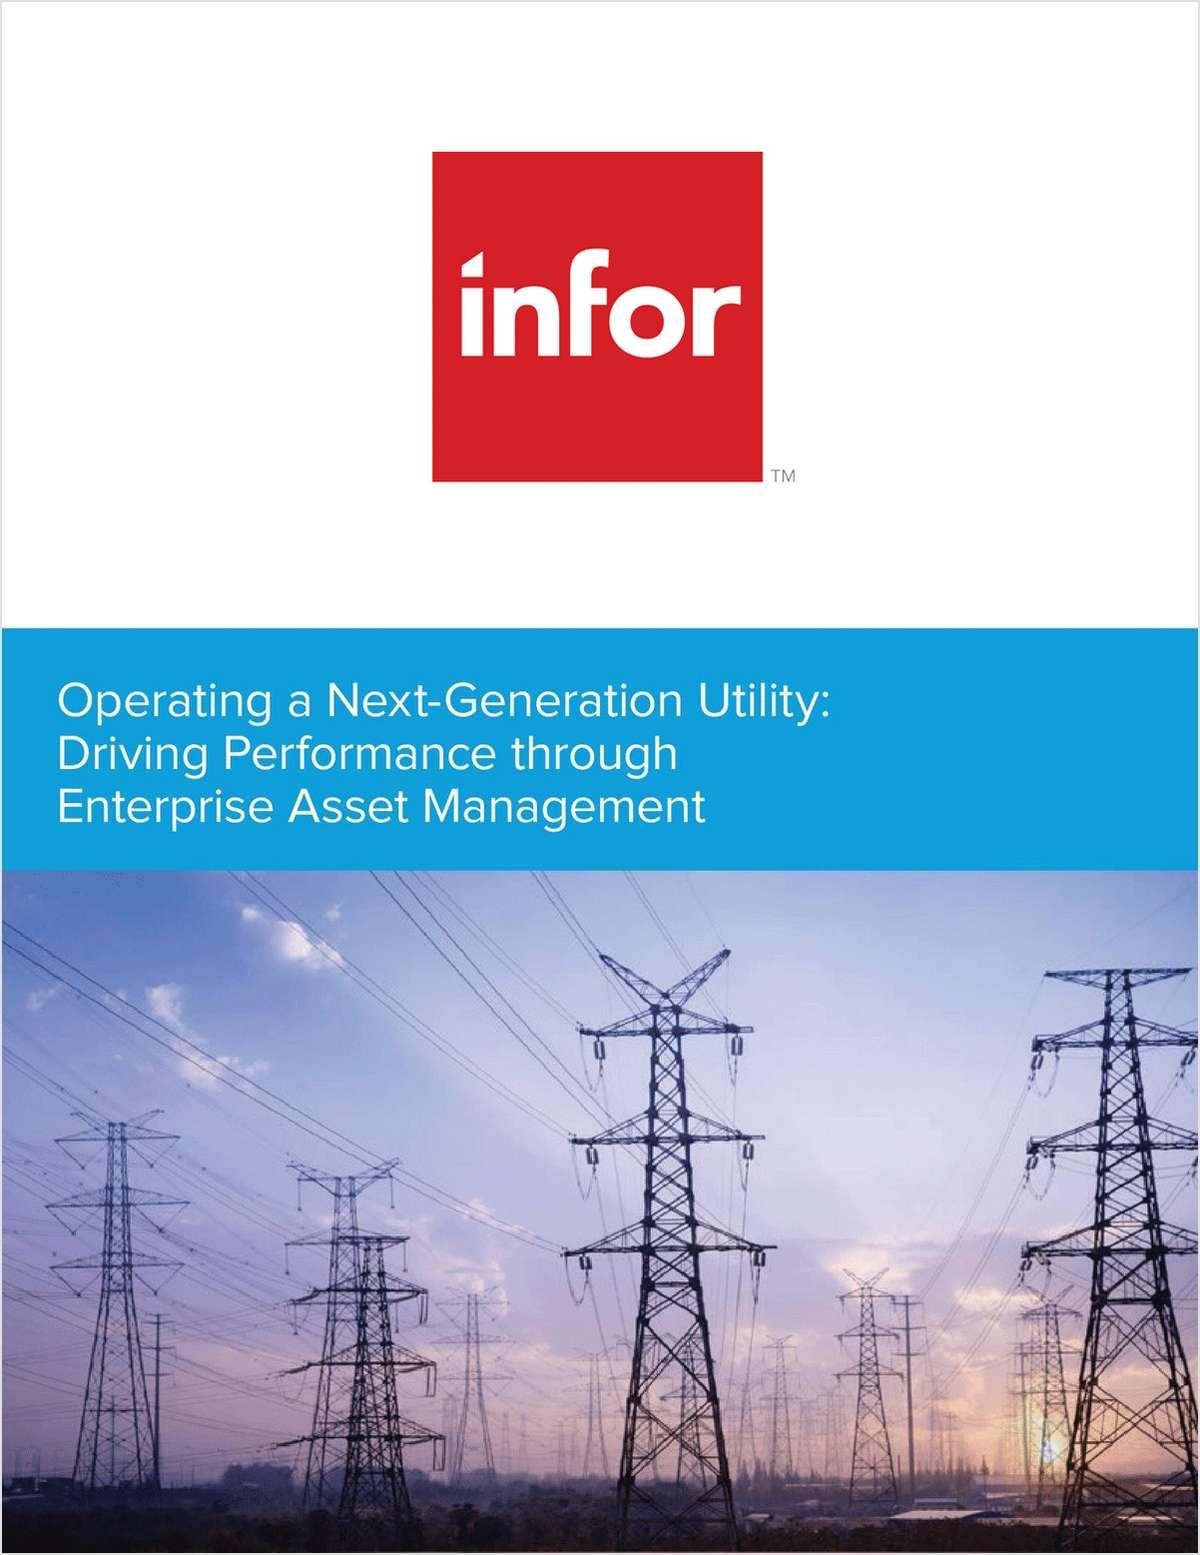 Operating a Next-Generation Utility: Driving Performance through Enterprise Asset Management